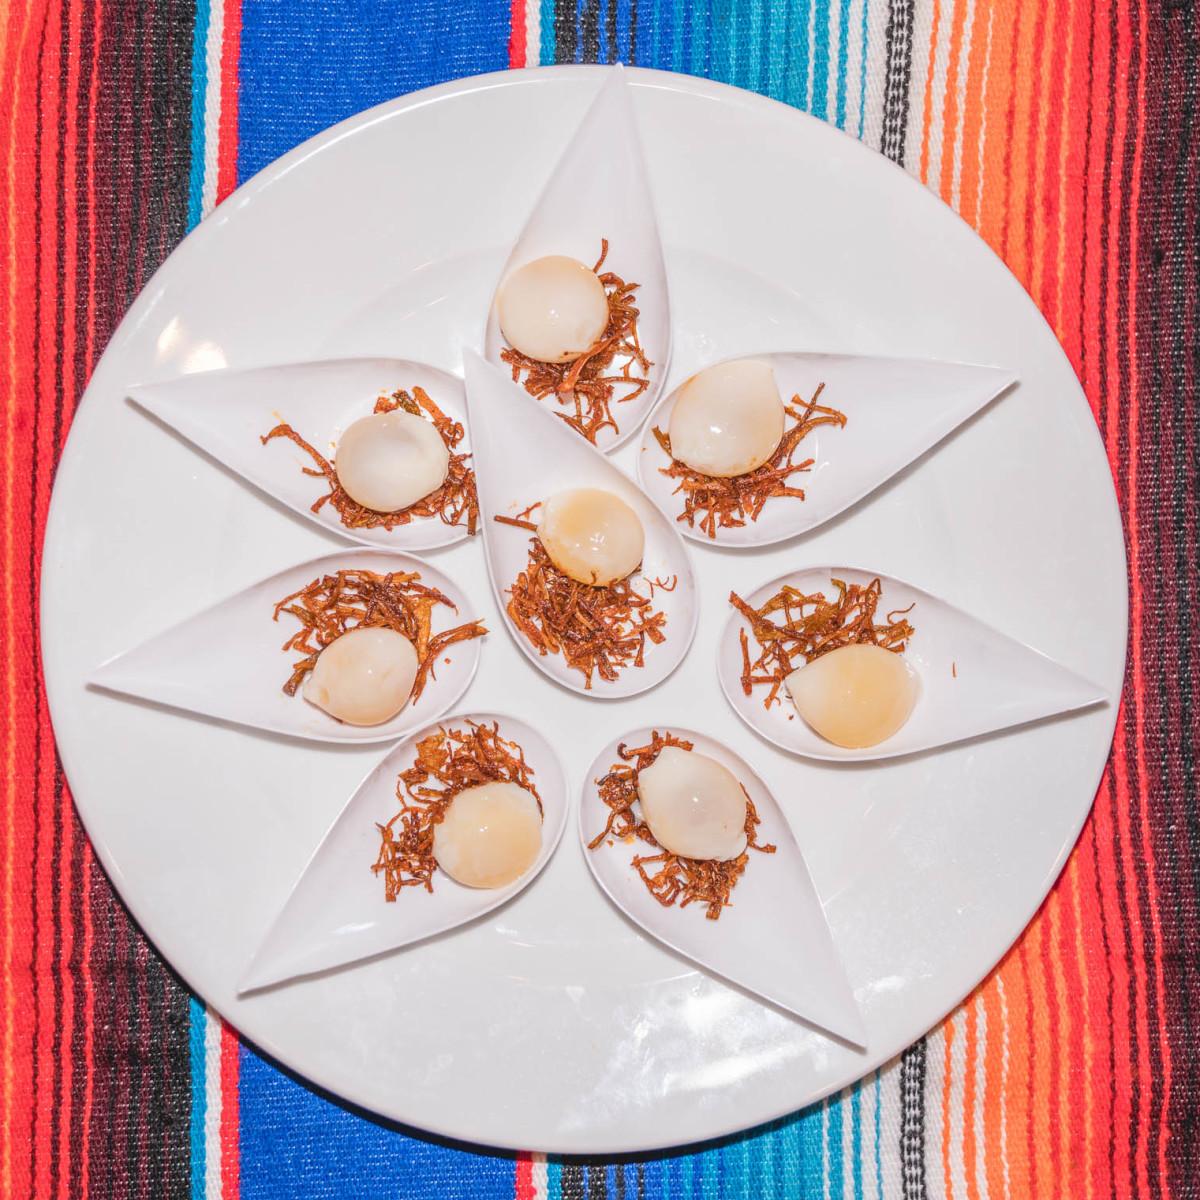 CultureMap Tastemakers 2019 Bob Bullock Museum Pitchfork Pretty Pickled Quail Eggs